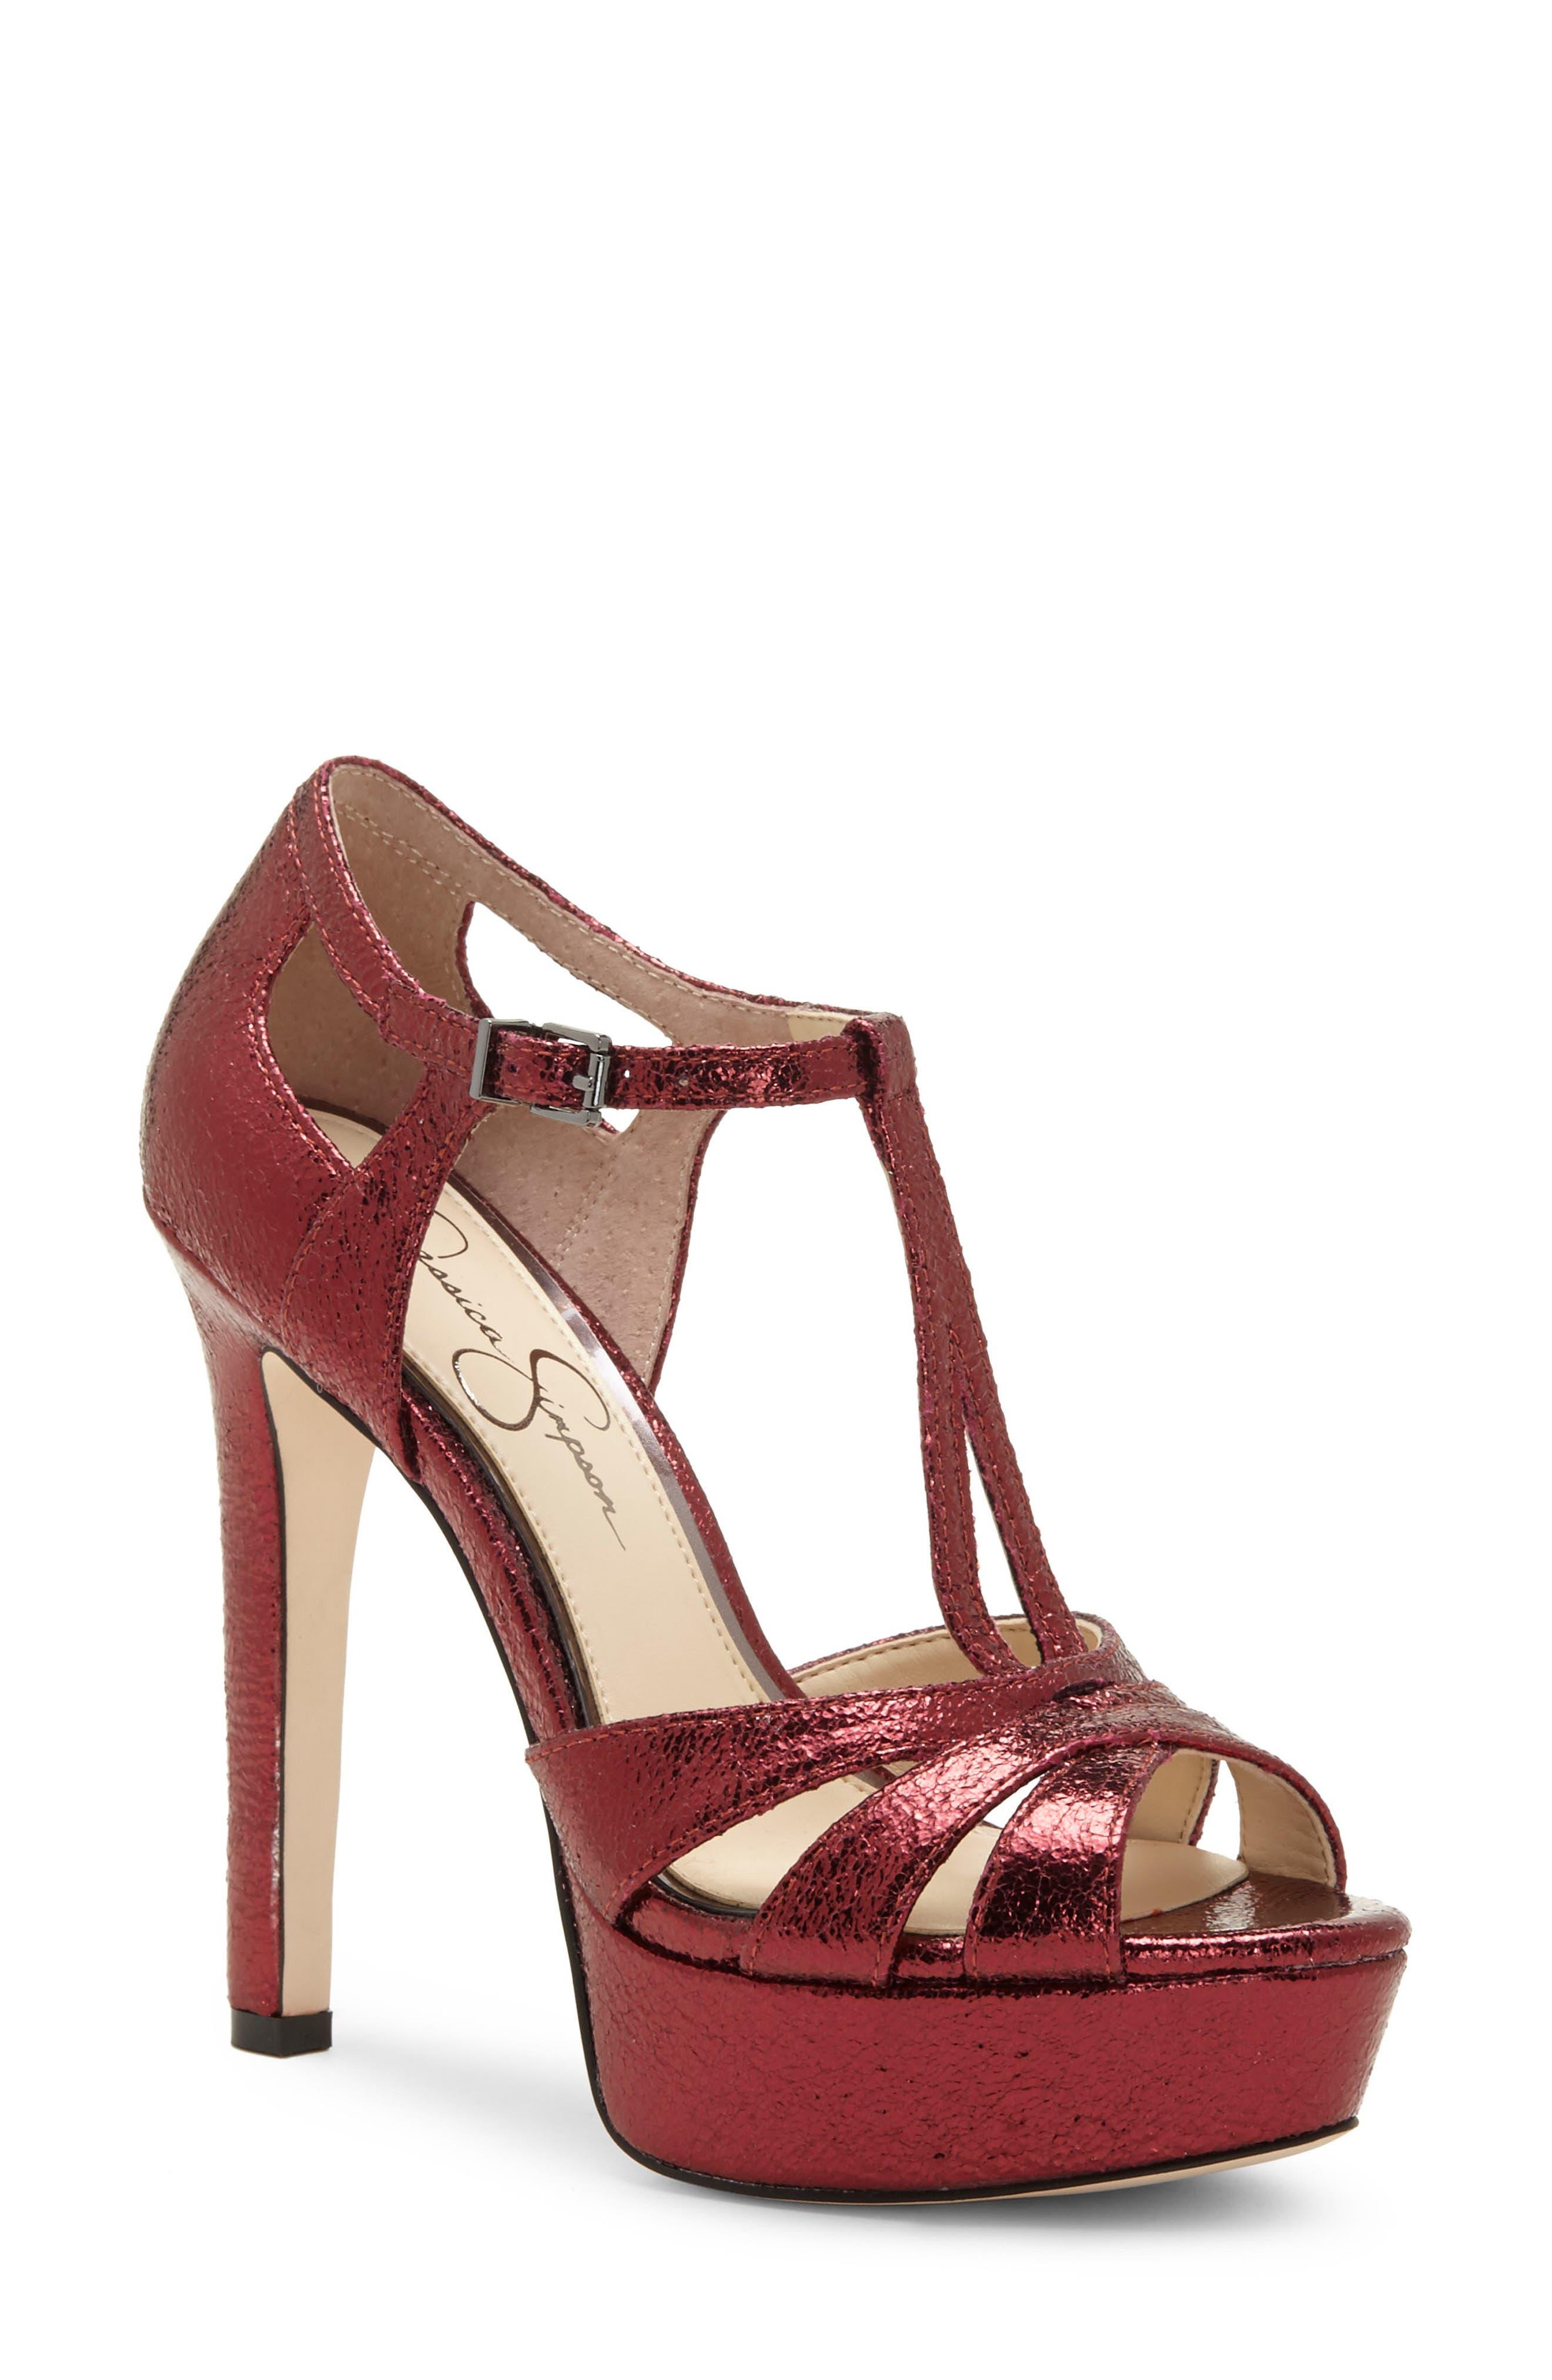 Jessica Simpson Bryanne Sandal, Red